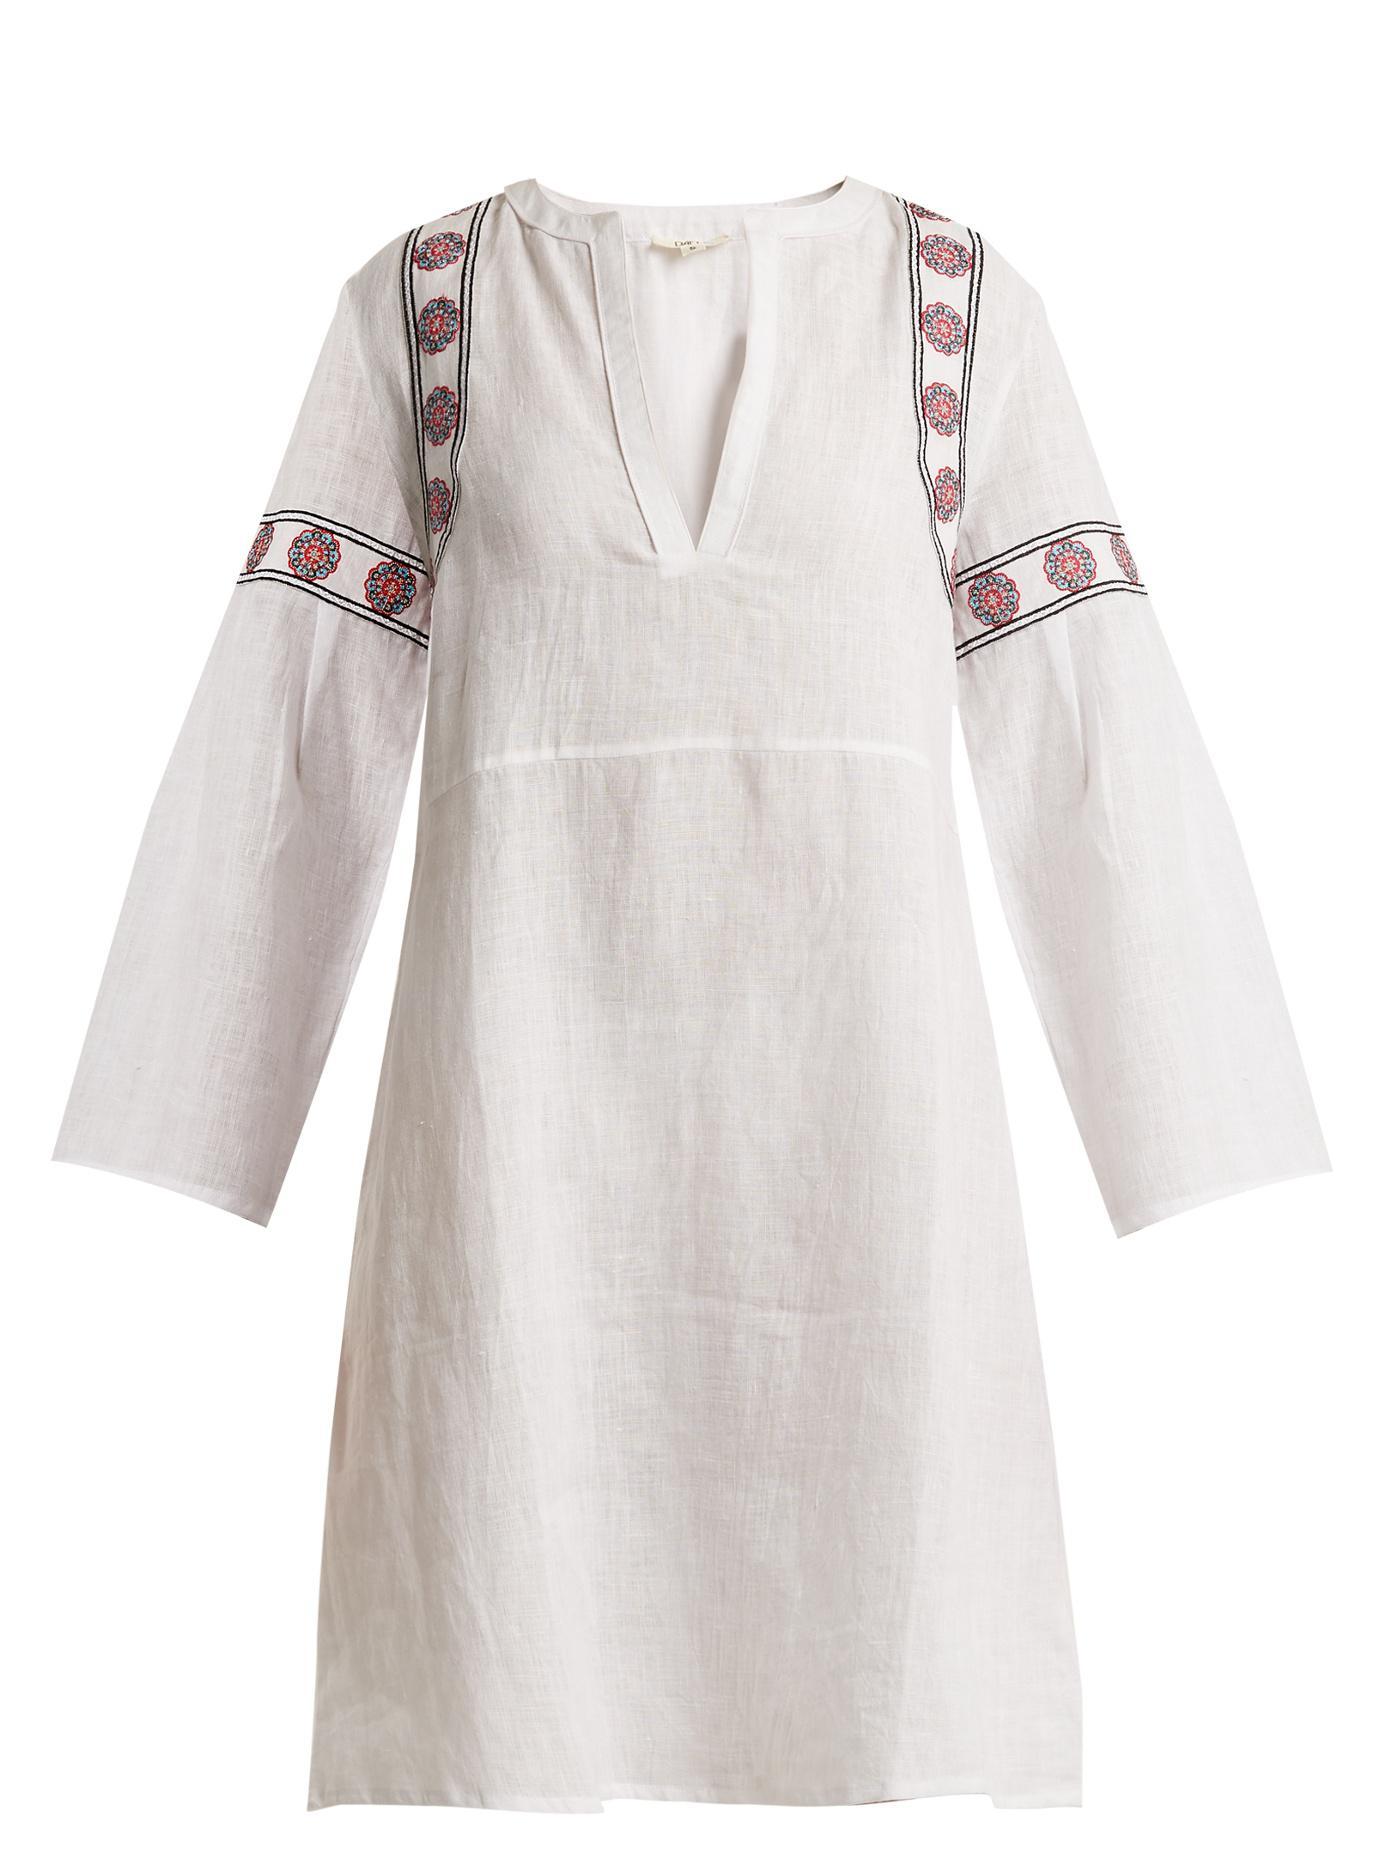 Discount The Cheapest Buy Cheap Hot Sale Pantelleria embroidered-linen kaftan dress Daft Best Seller Shopping Online Cheap Price lYouaIyPzW